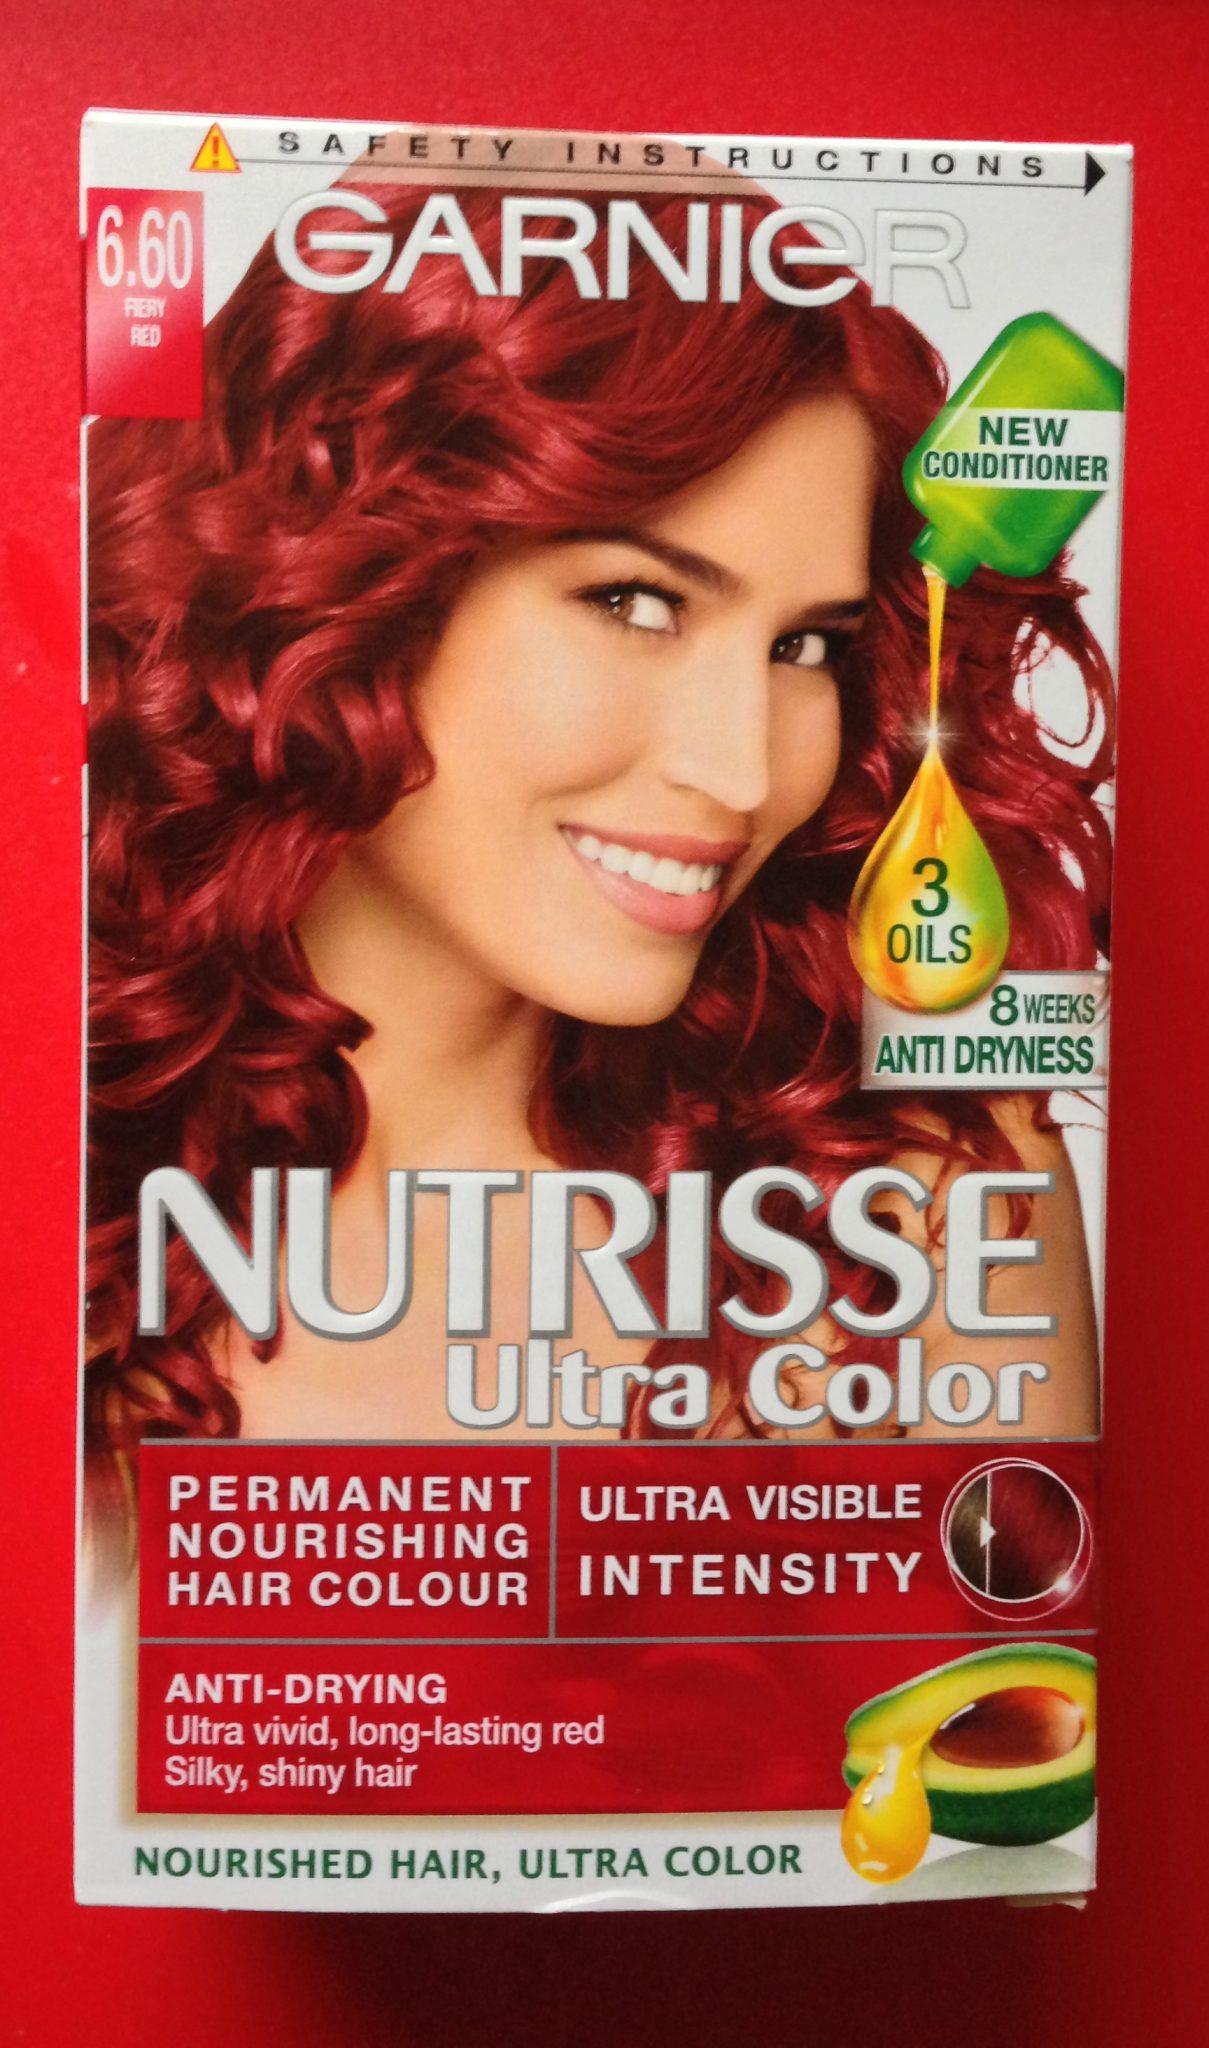 Review Garnier Nutrisse Ultra Color Fiery Red 660 30somethingmel